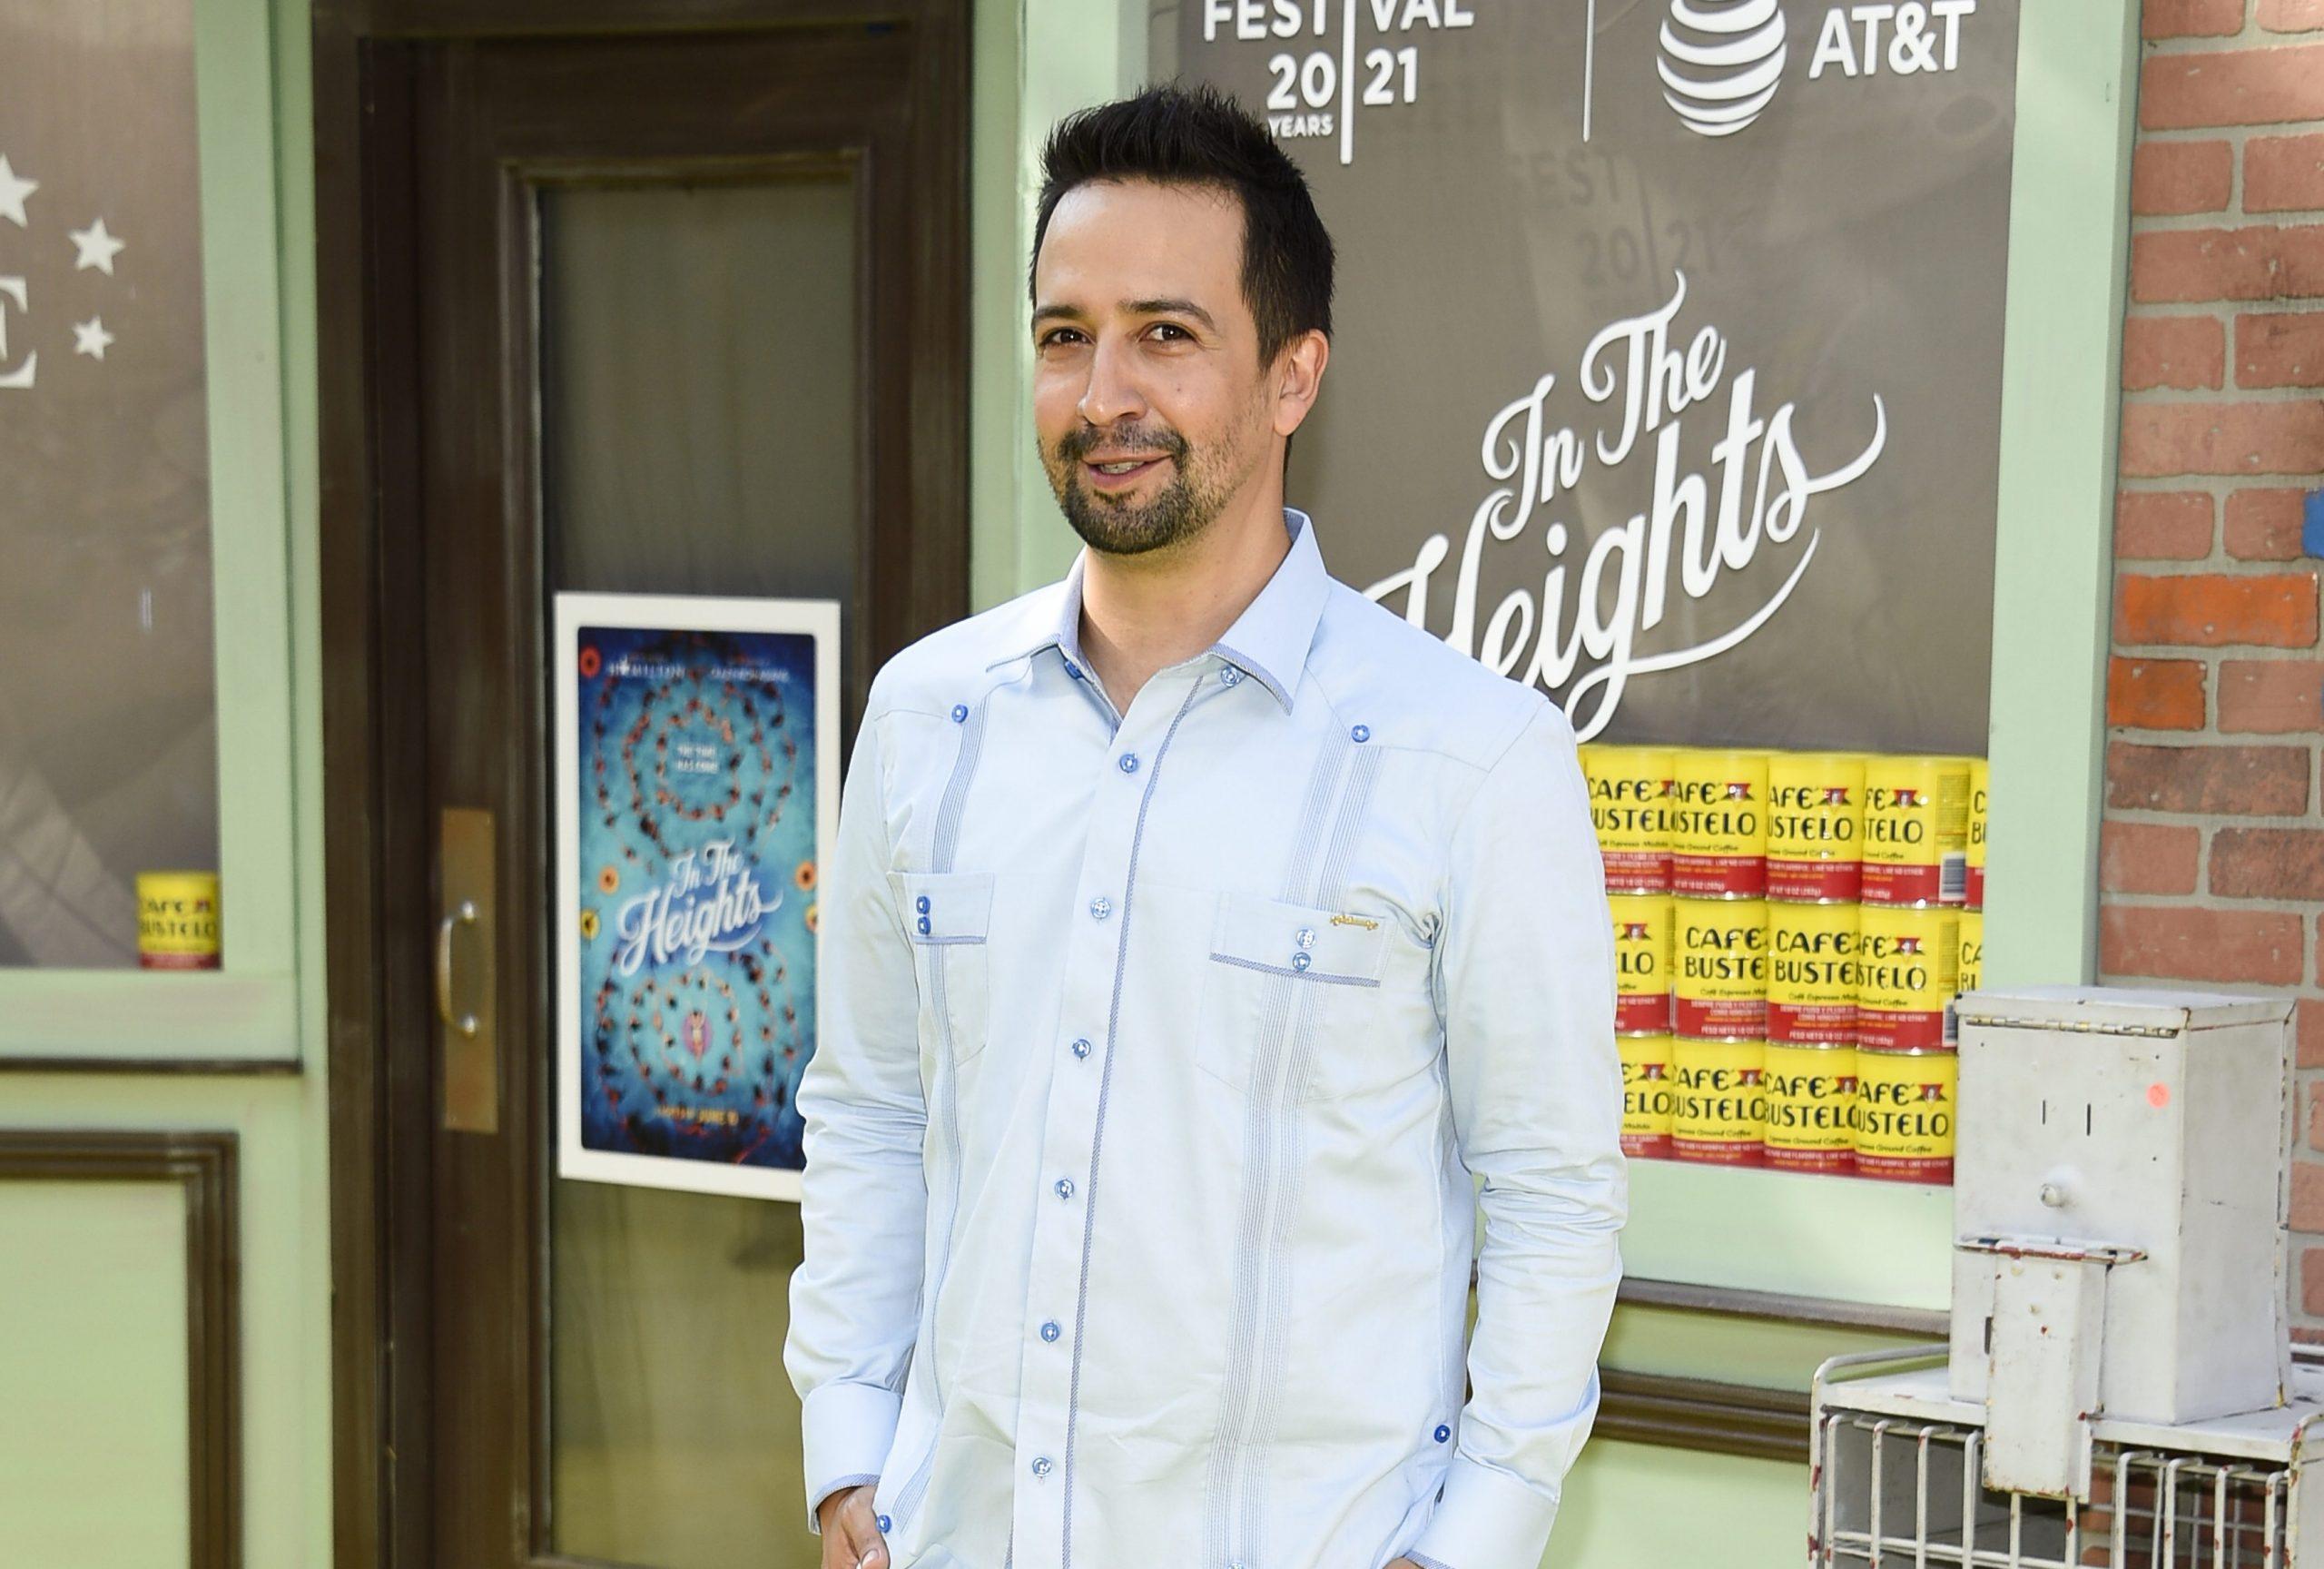 SOURCE LATINO: Lin-Manuel Miranda on 'In The Heights' Backlash: 'We Fell Short'